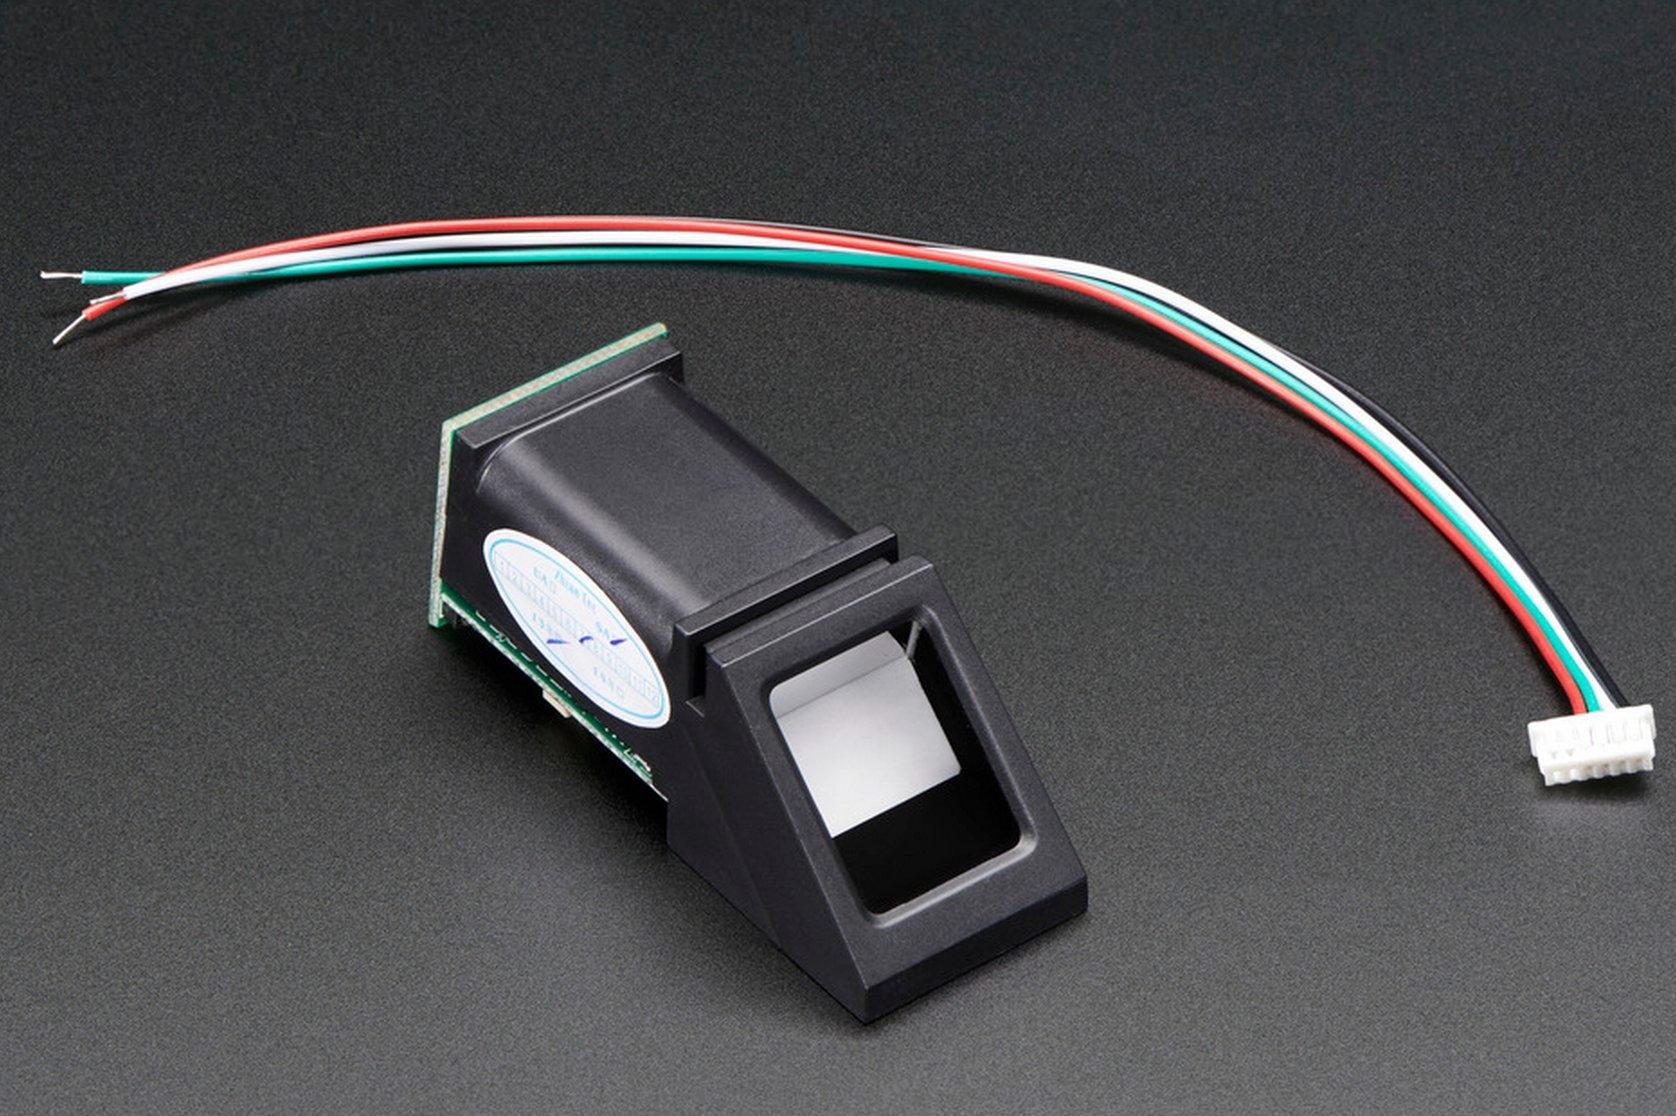 Adafruit Fingerprint Sensor 751 - Scanner De Huella Digital